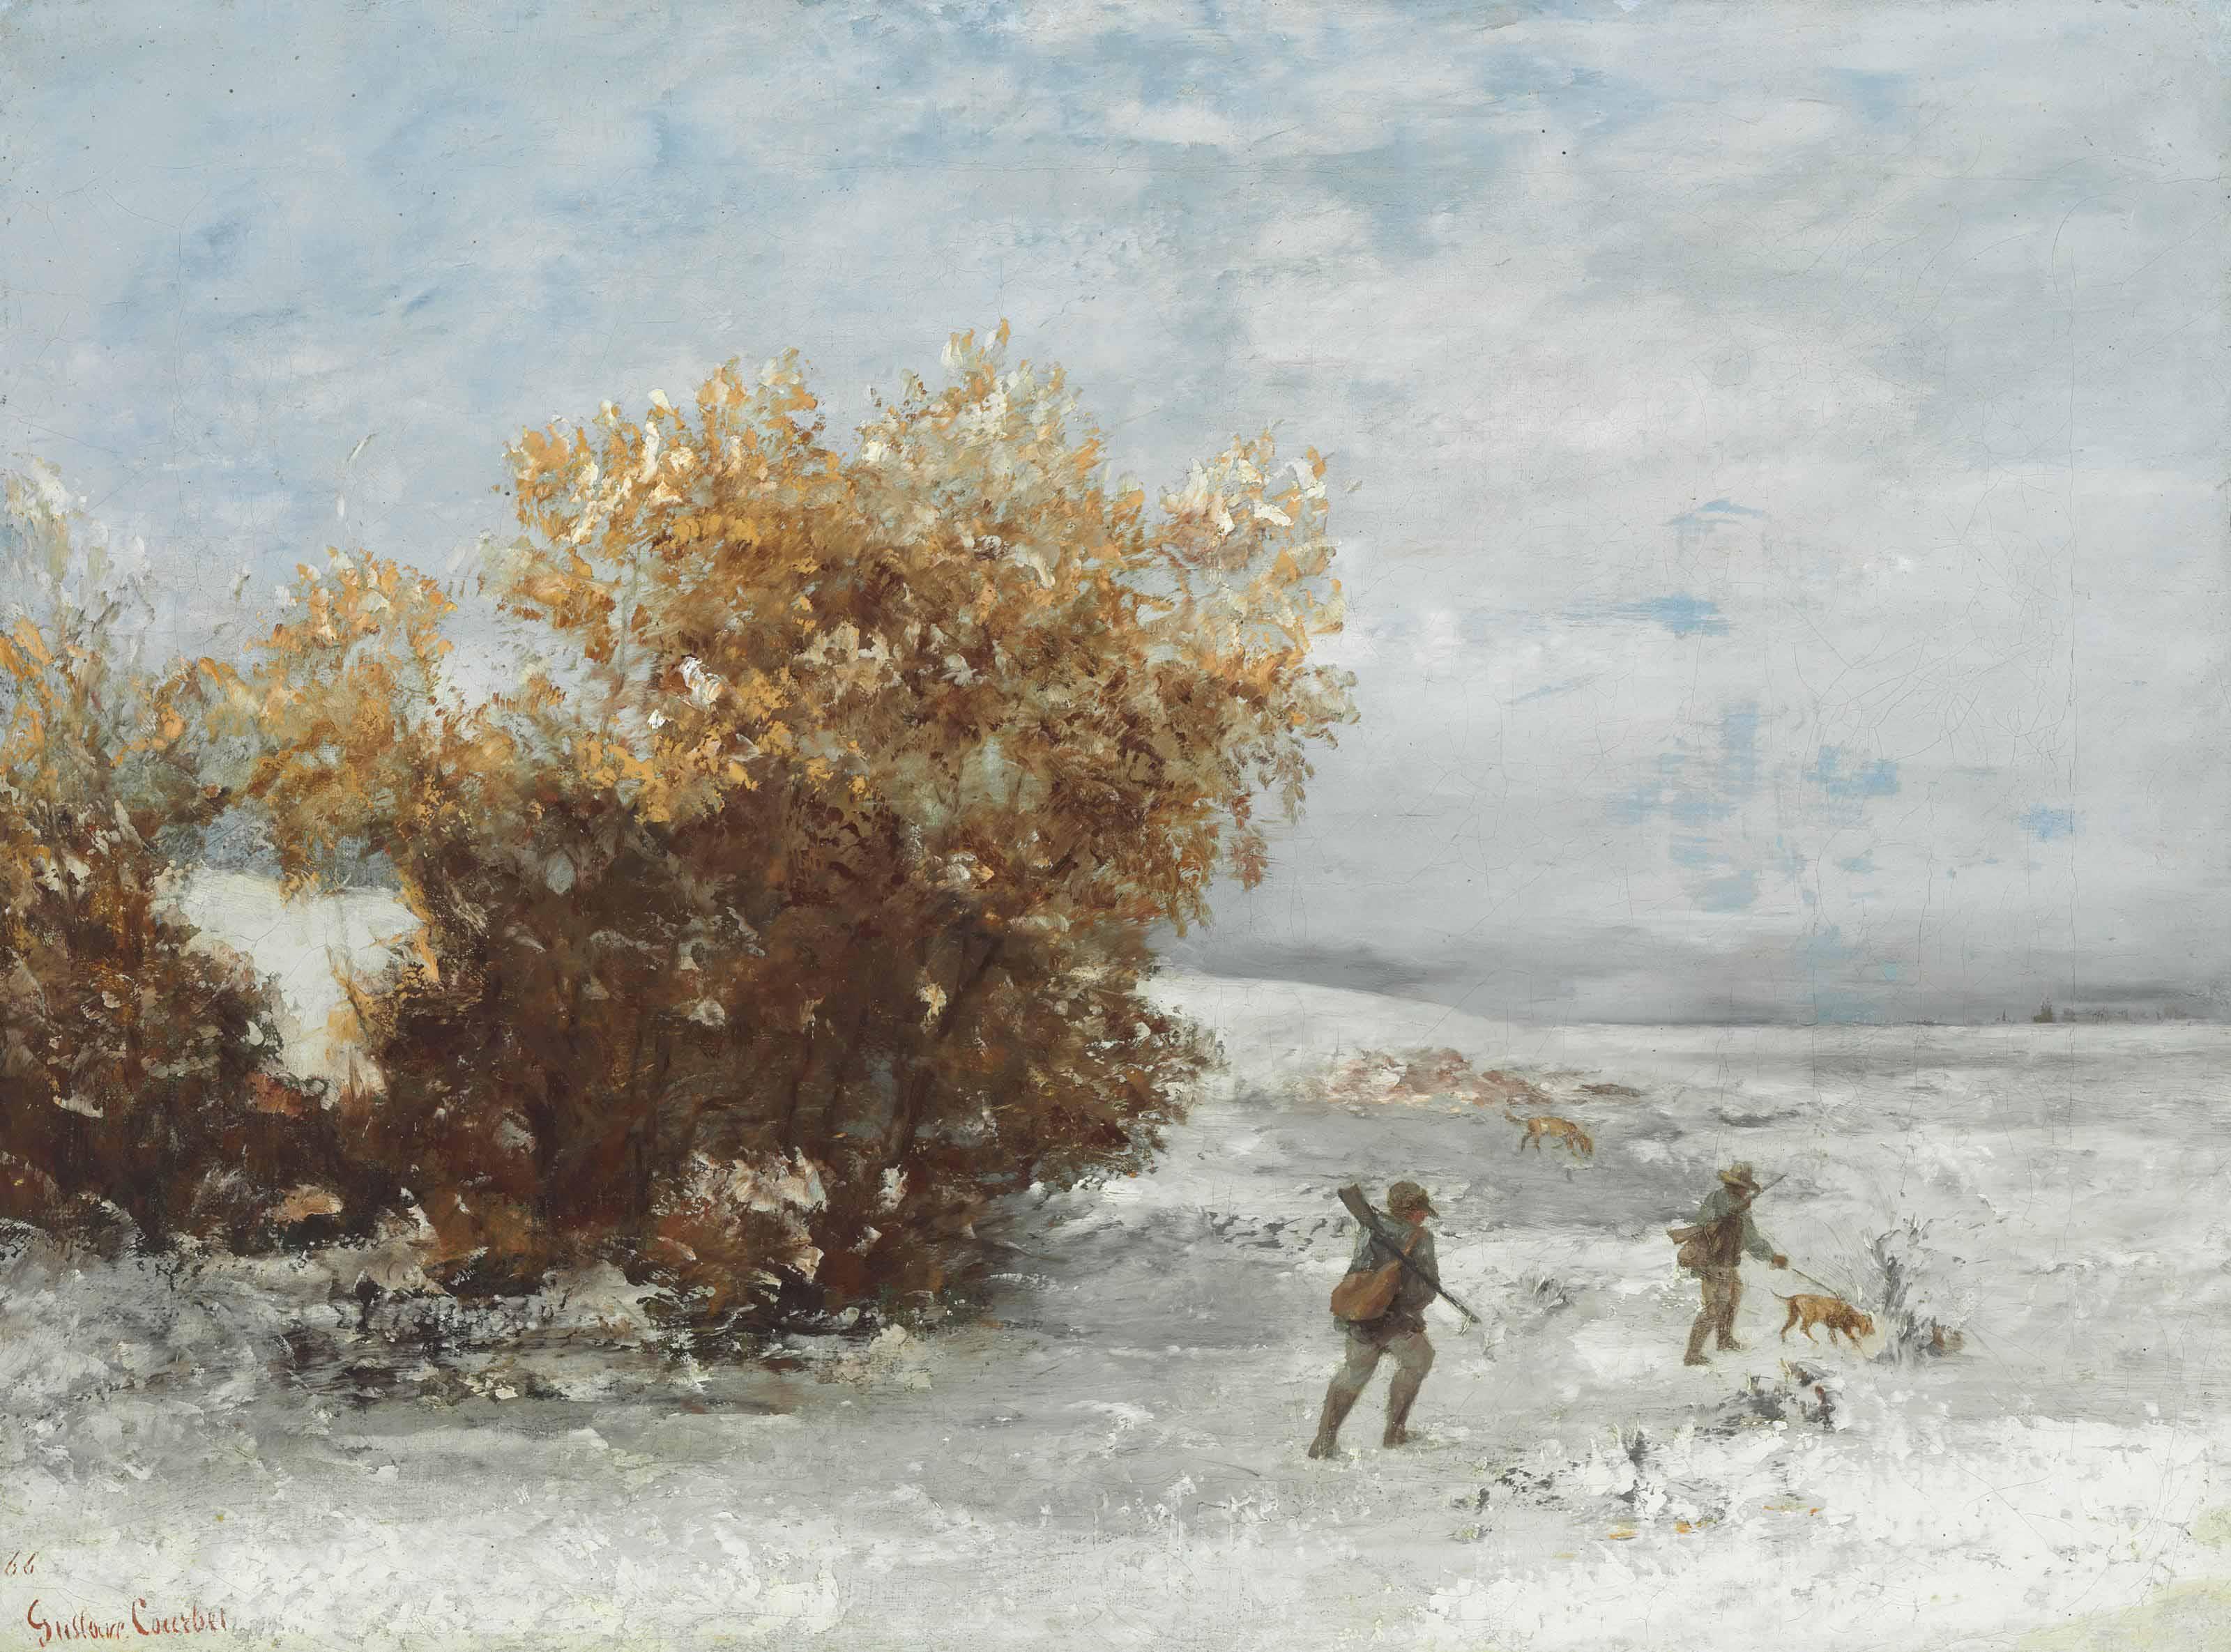 Chasseurs dans le neige